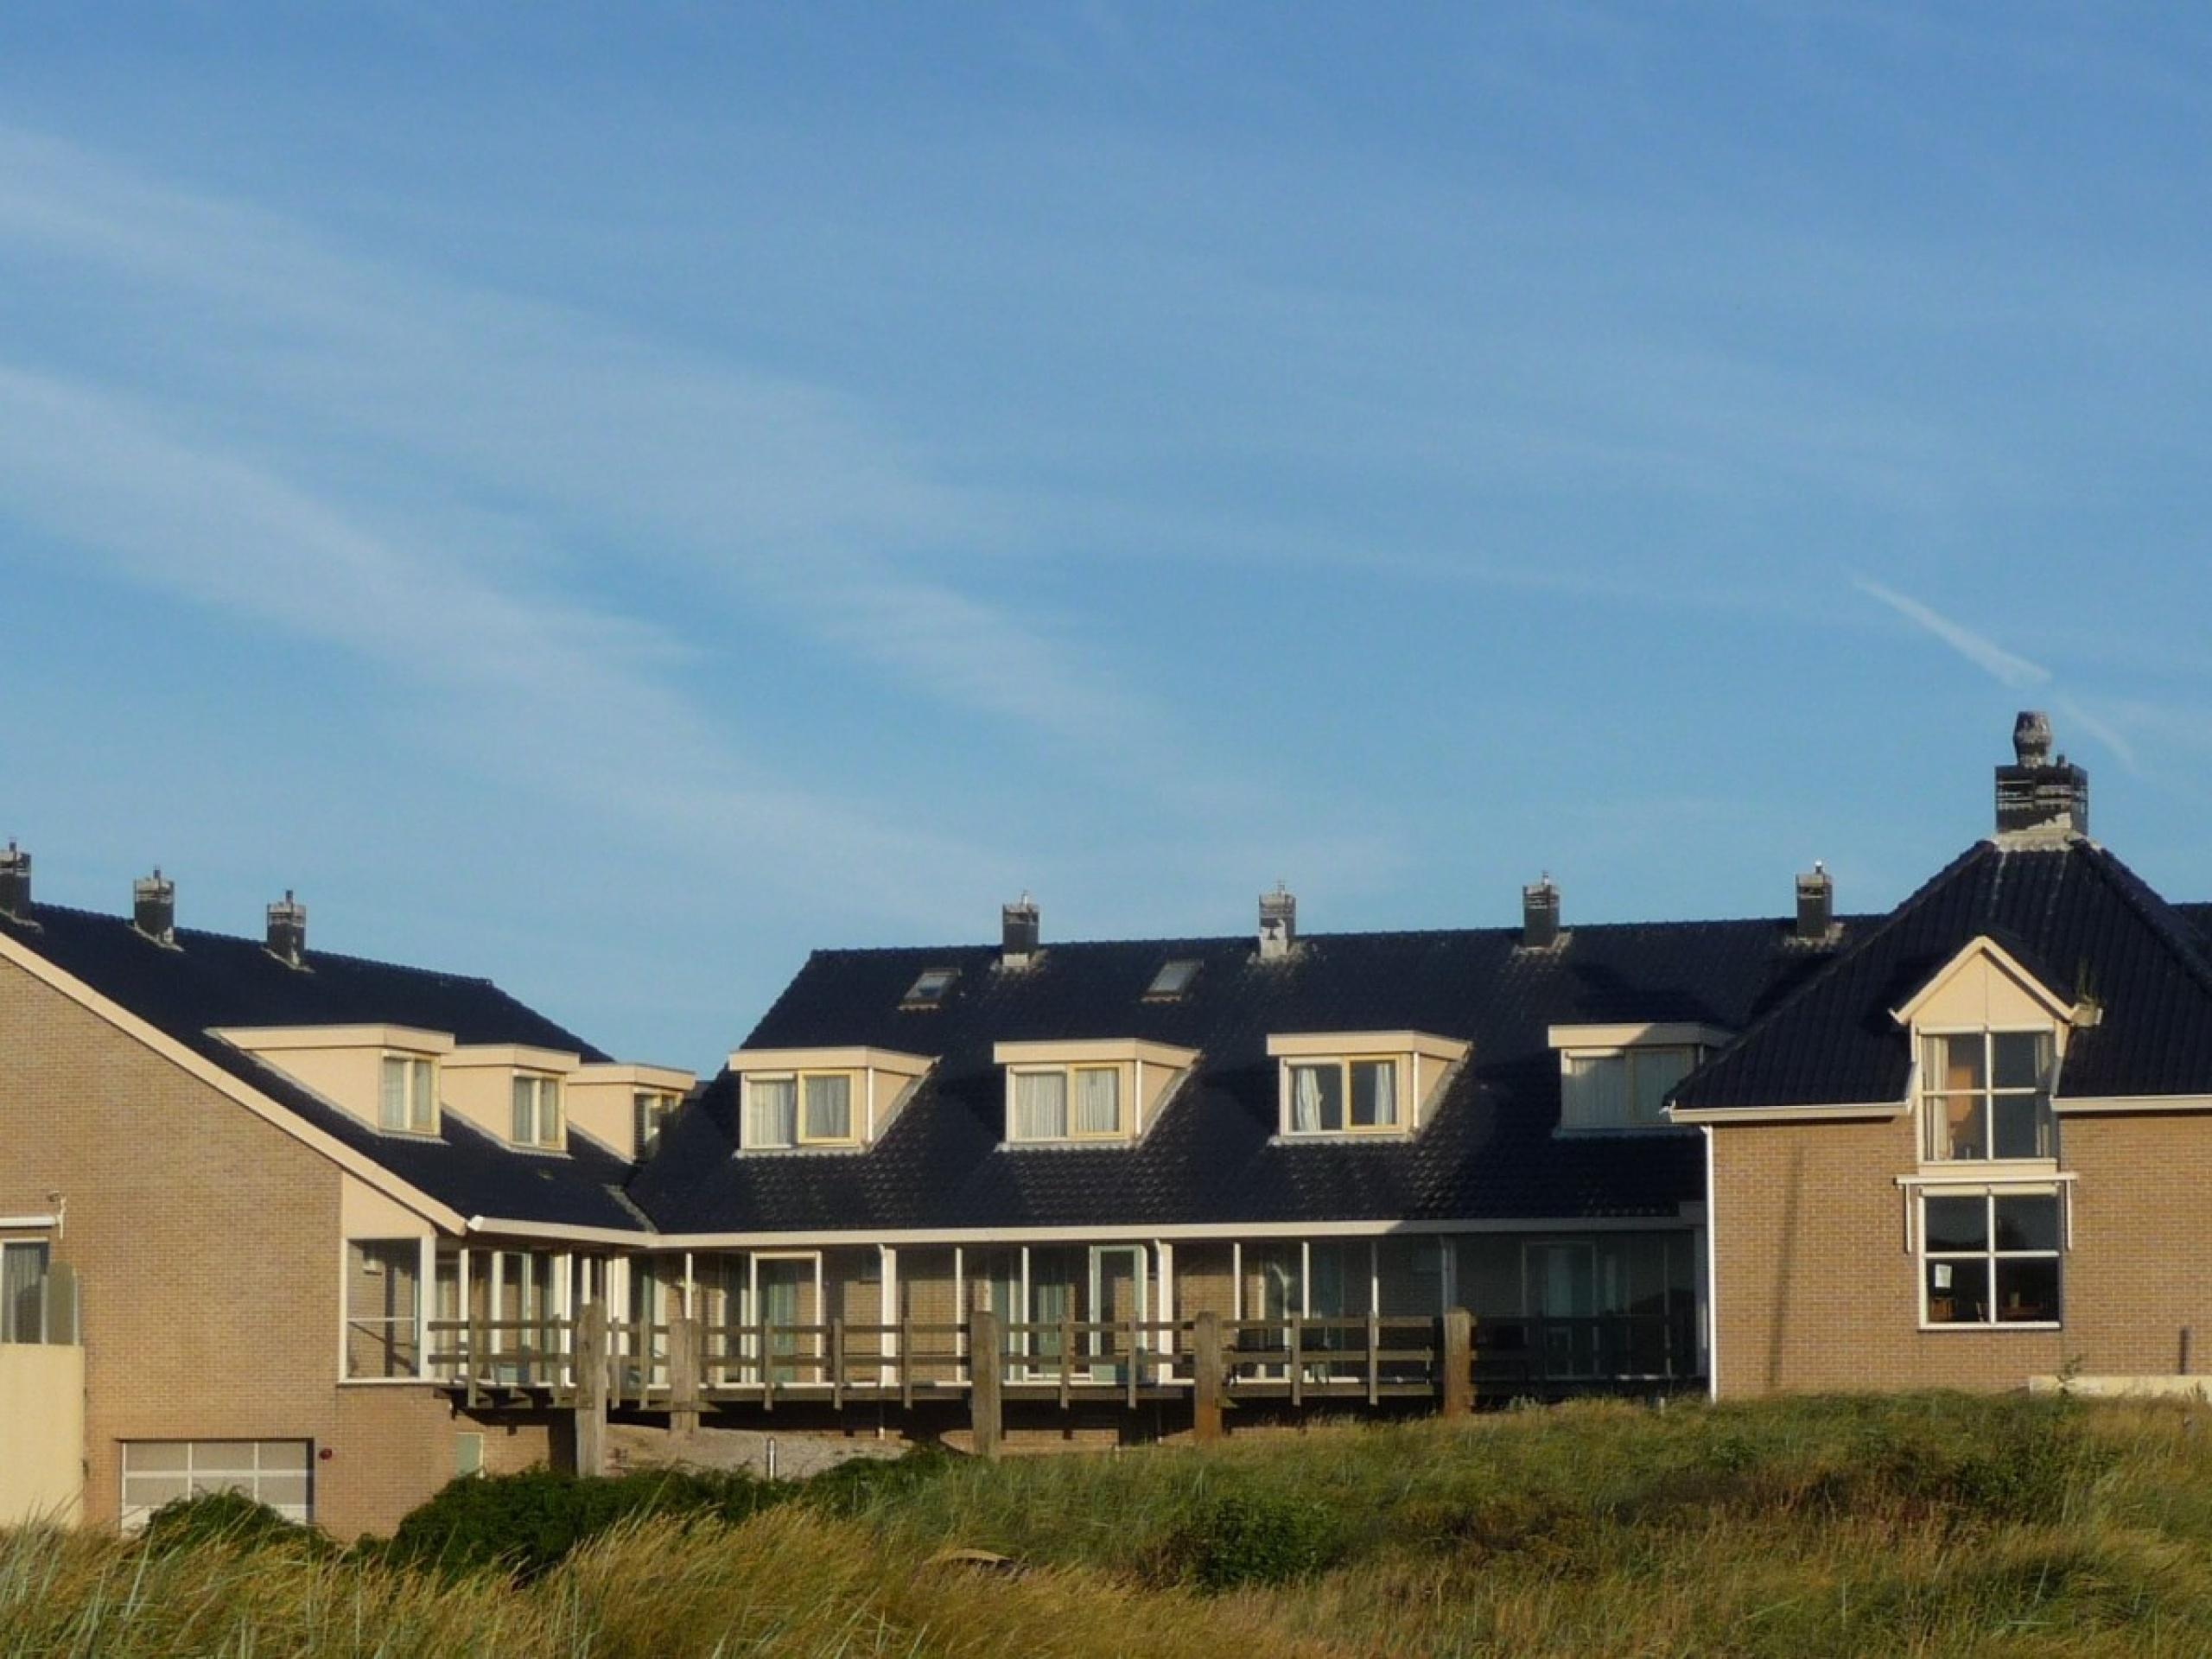 Luxury apartment in De Koog with great beach location